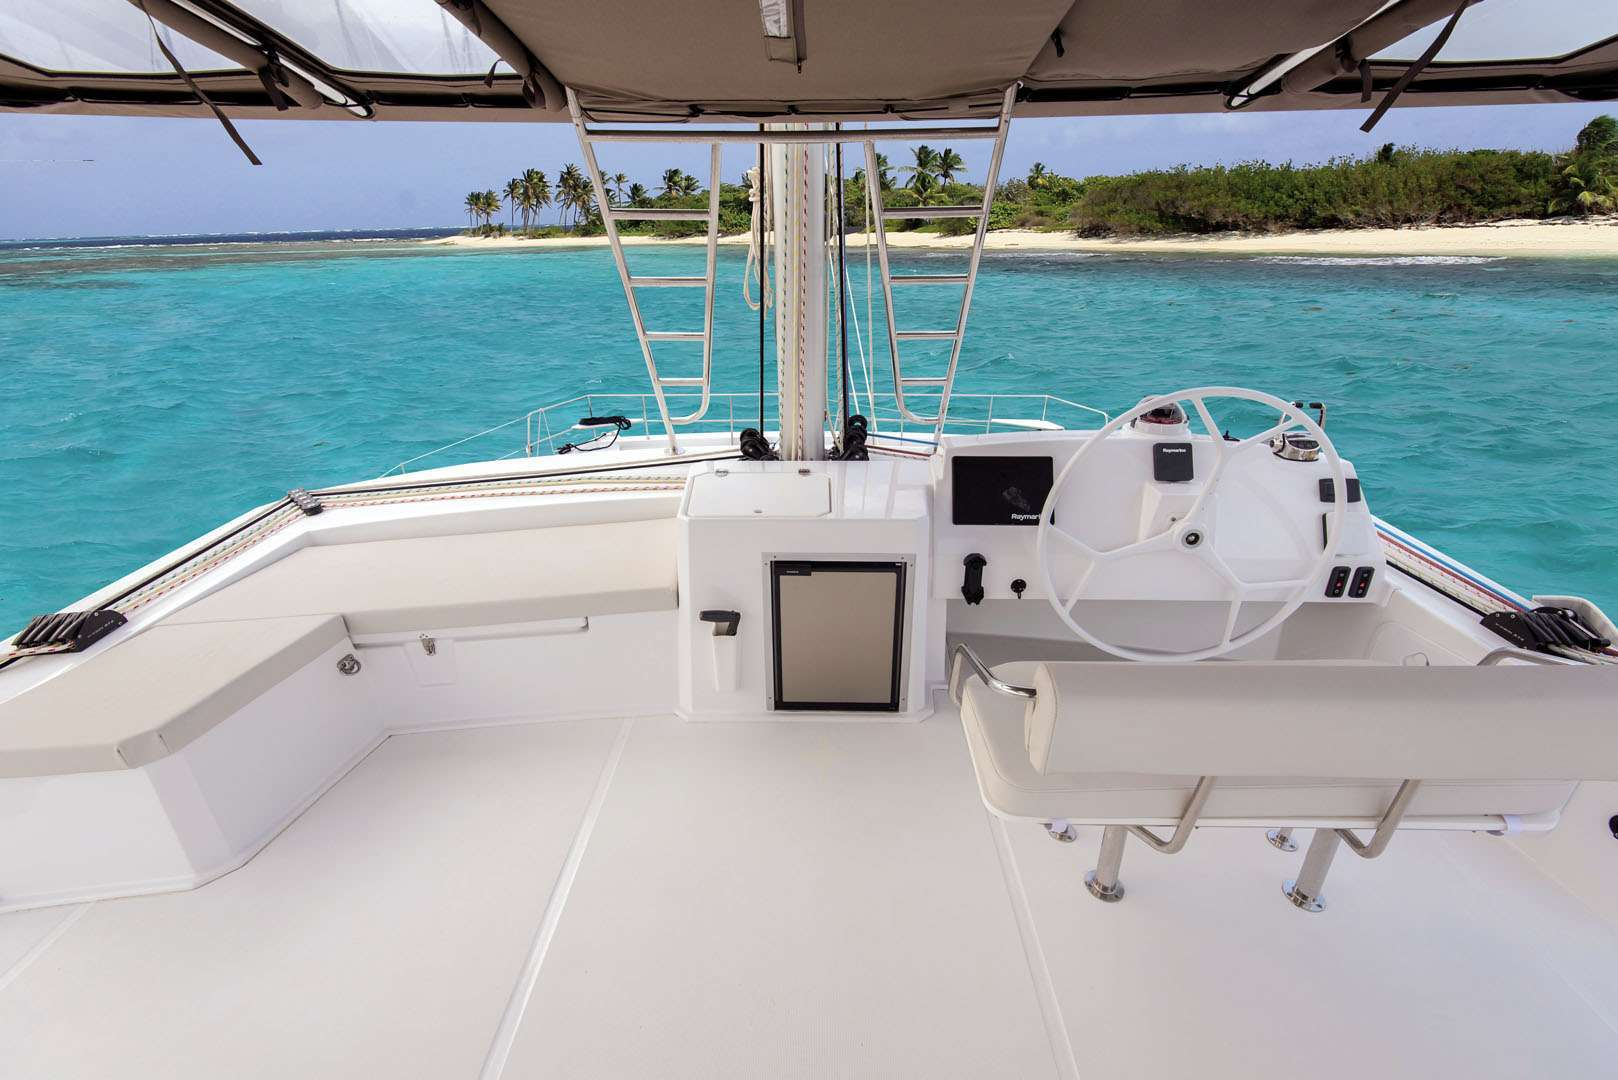 BIG NAUTI yacht image # 13